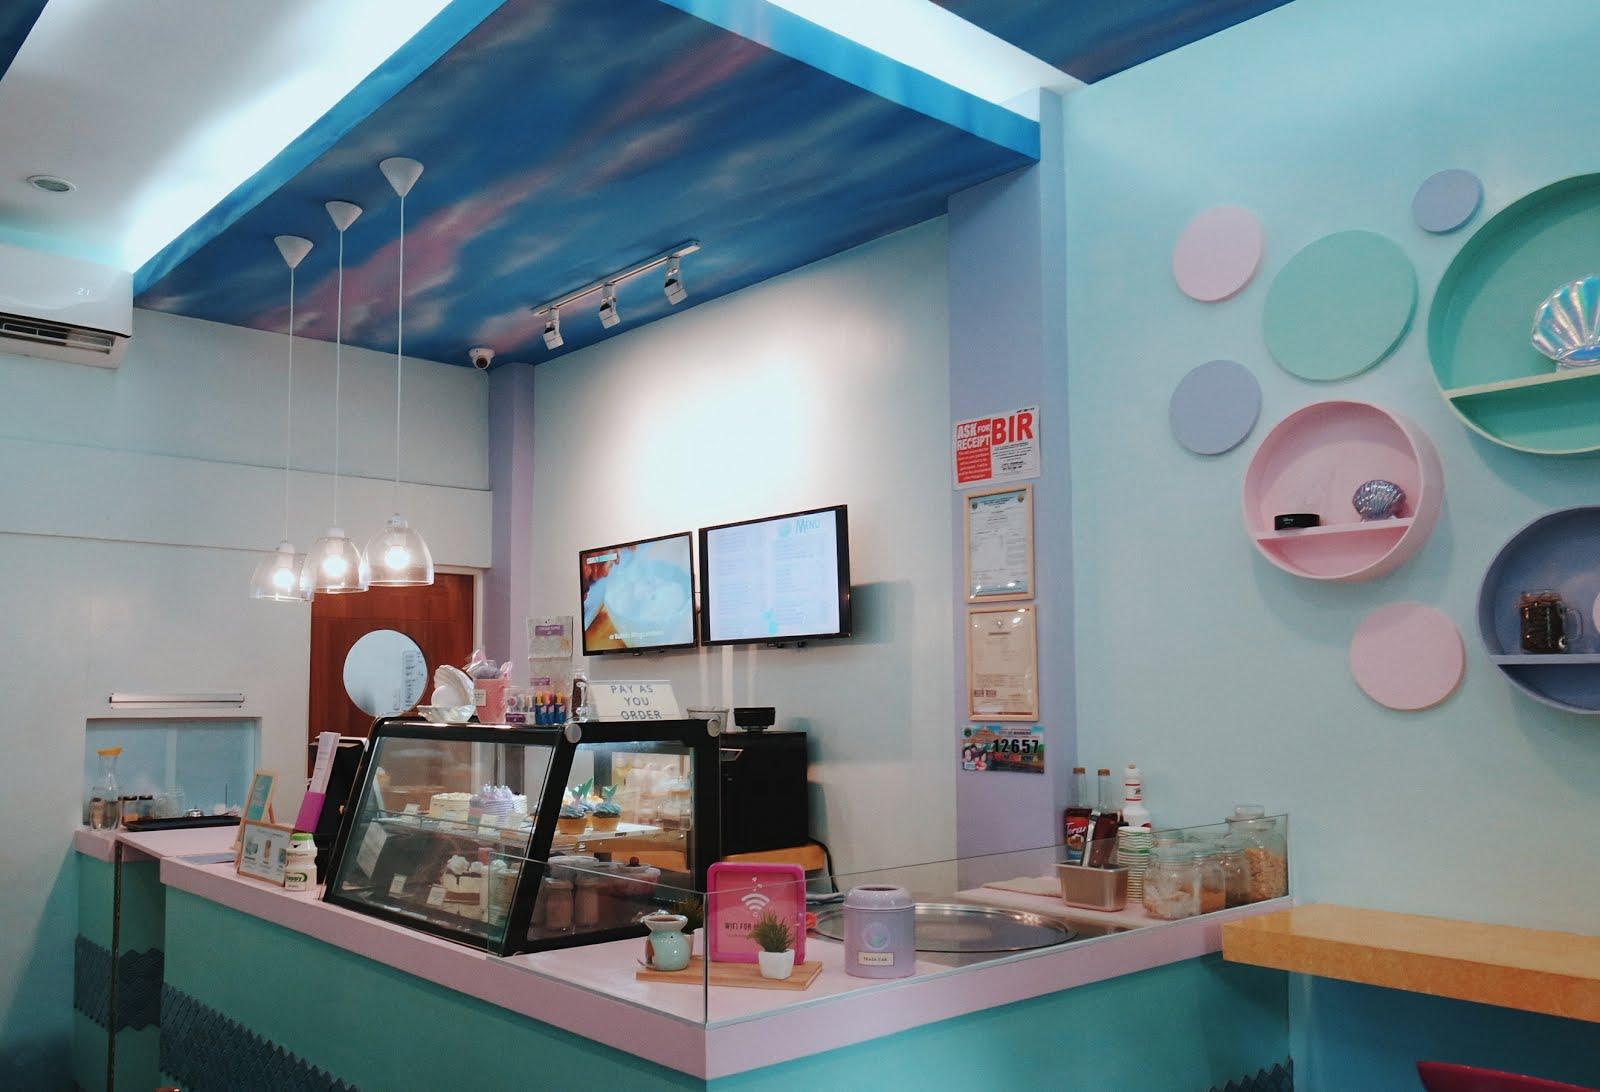 Foodtrip173 Cafe Mermania Pinkislovebynix